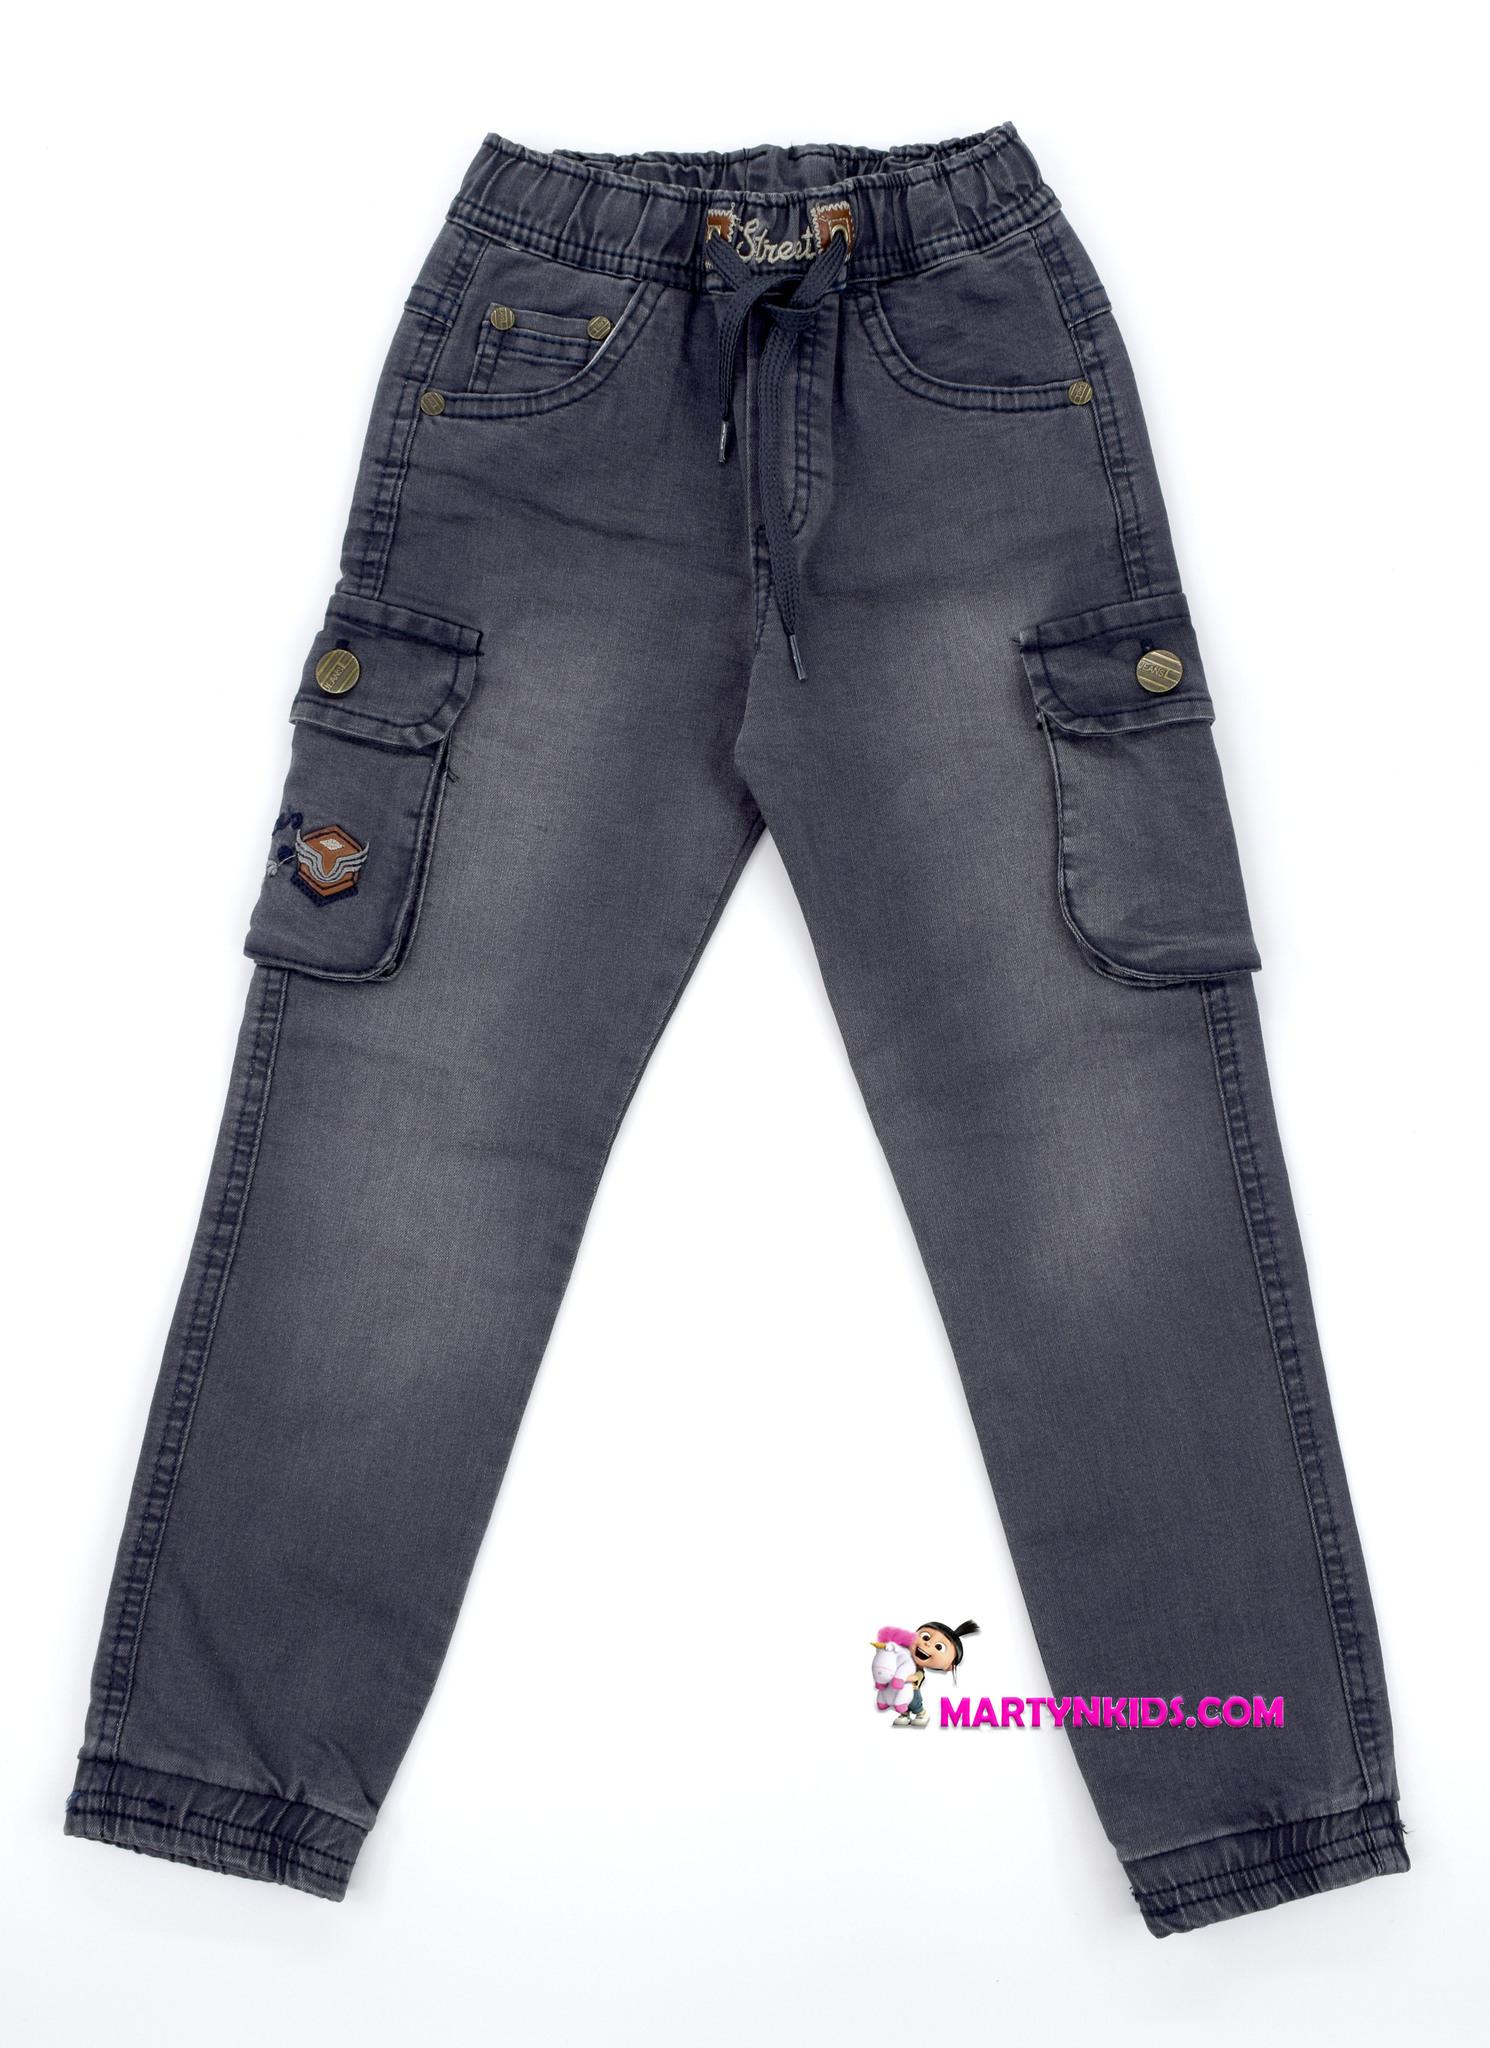 2338 джинсы джоггеры Street